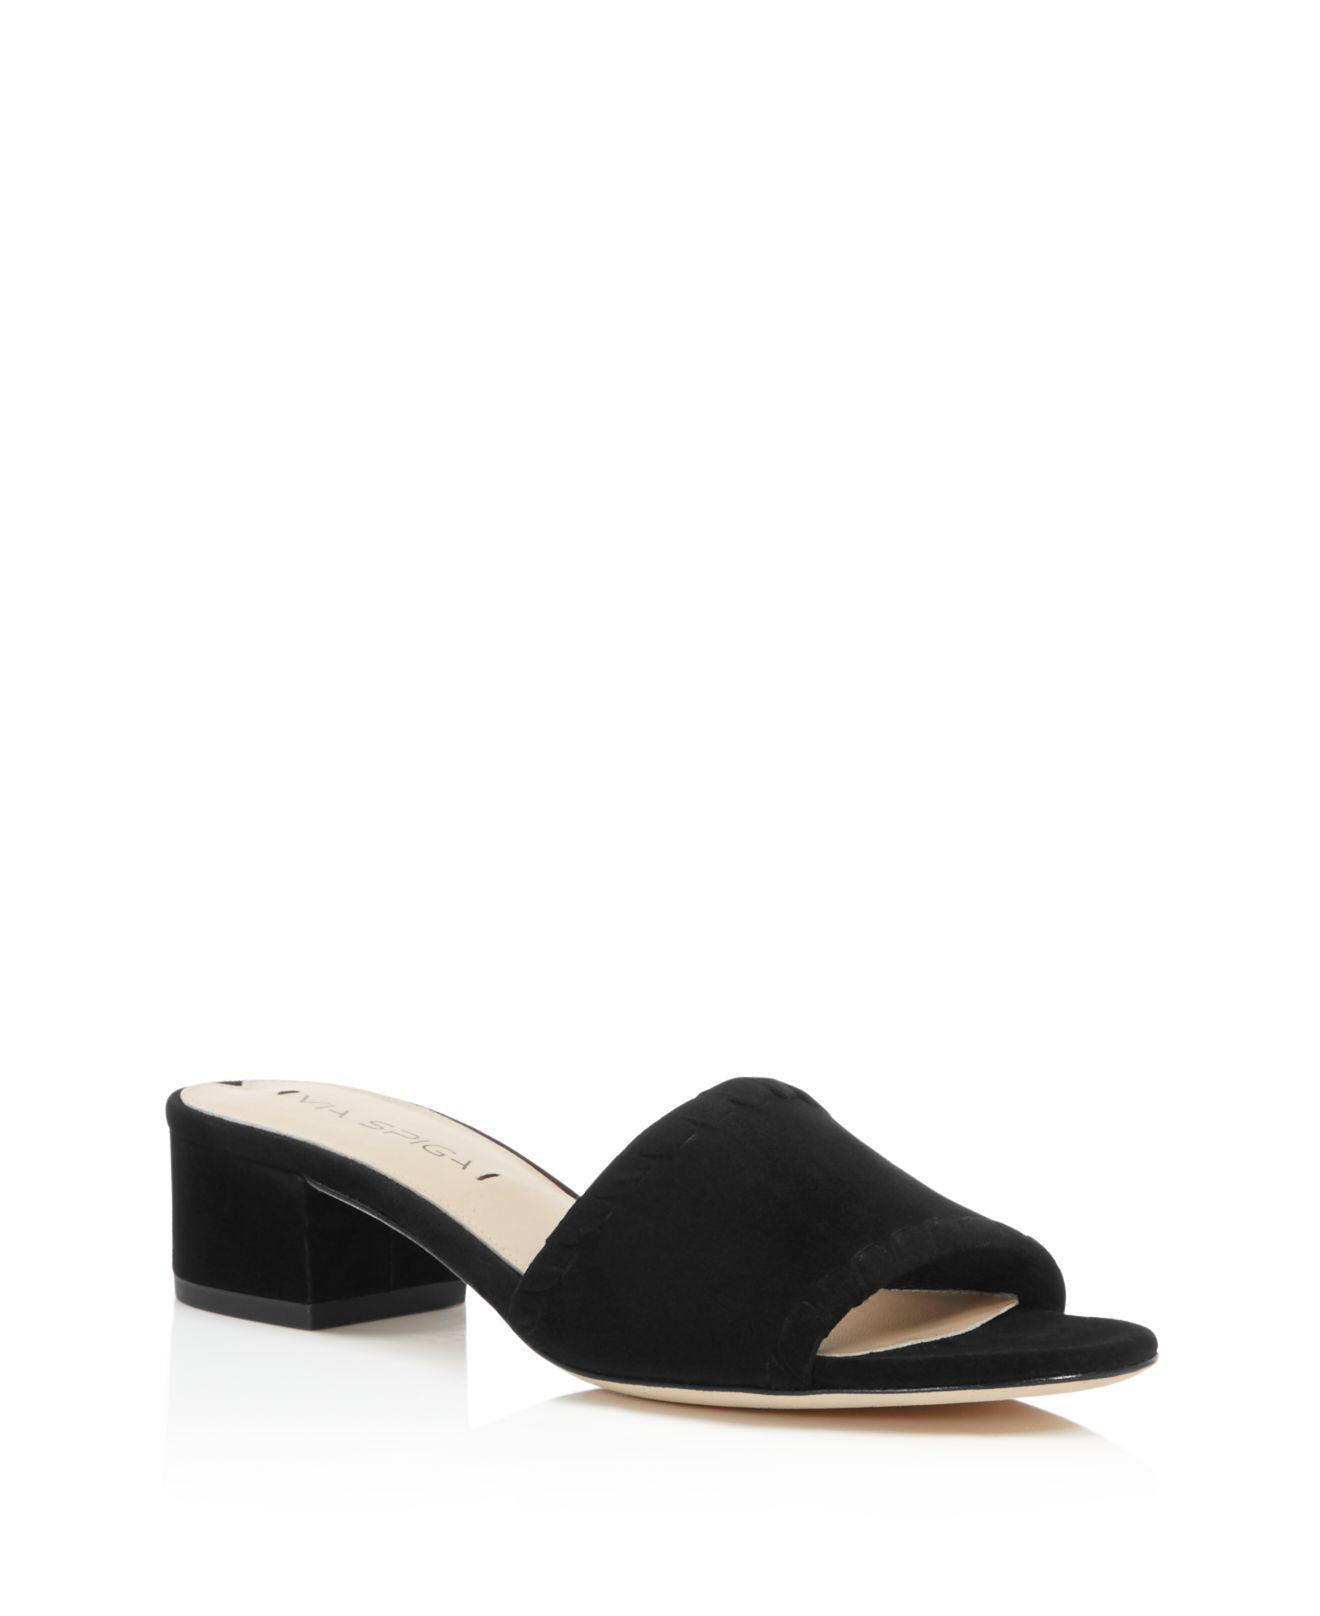 bbaa98f1fa Via Spiga Gwendolyn Low Heel Slide Sandals in Black - Lyst